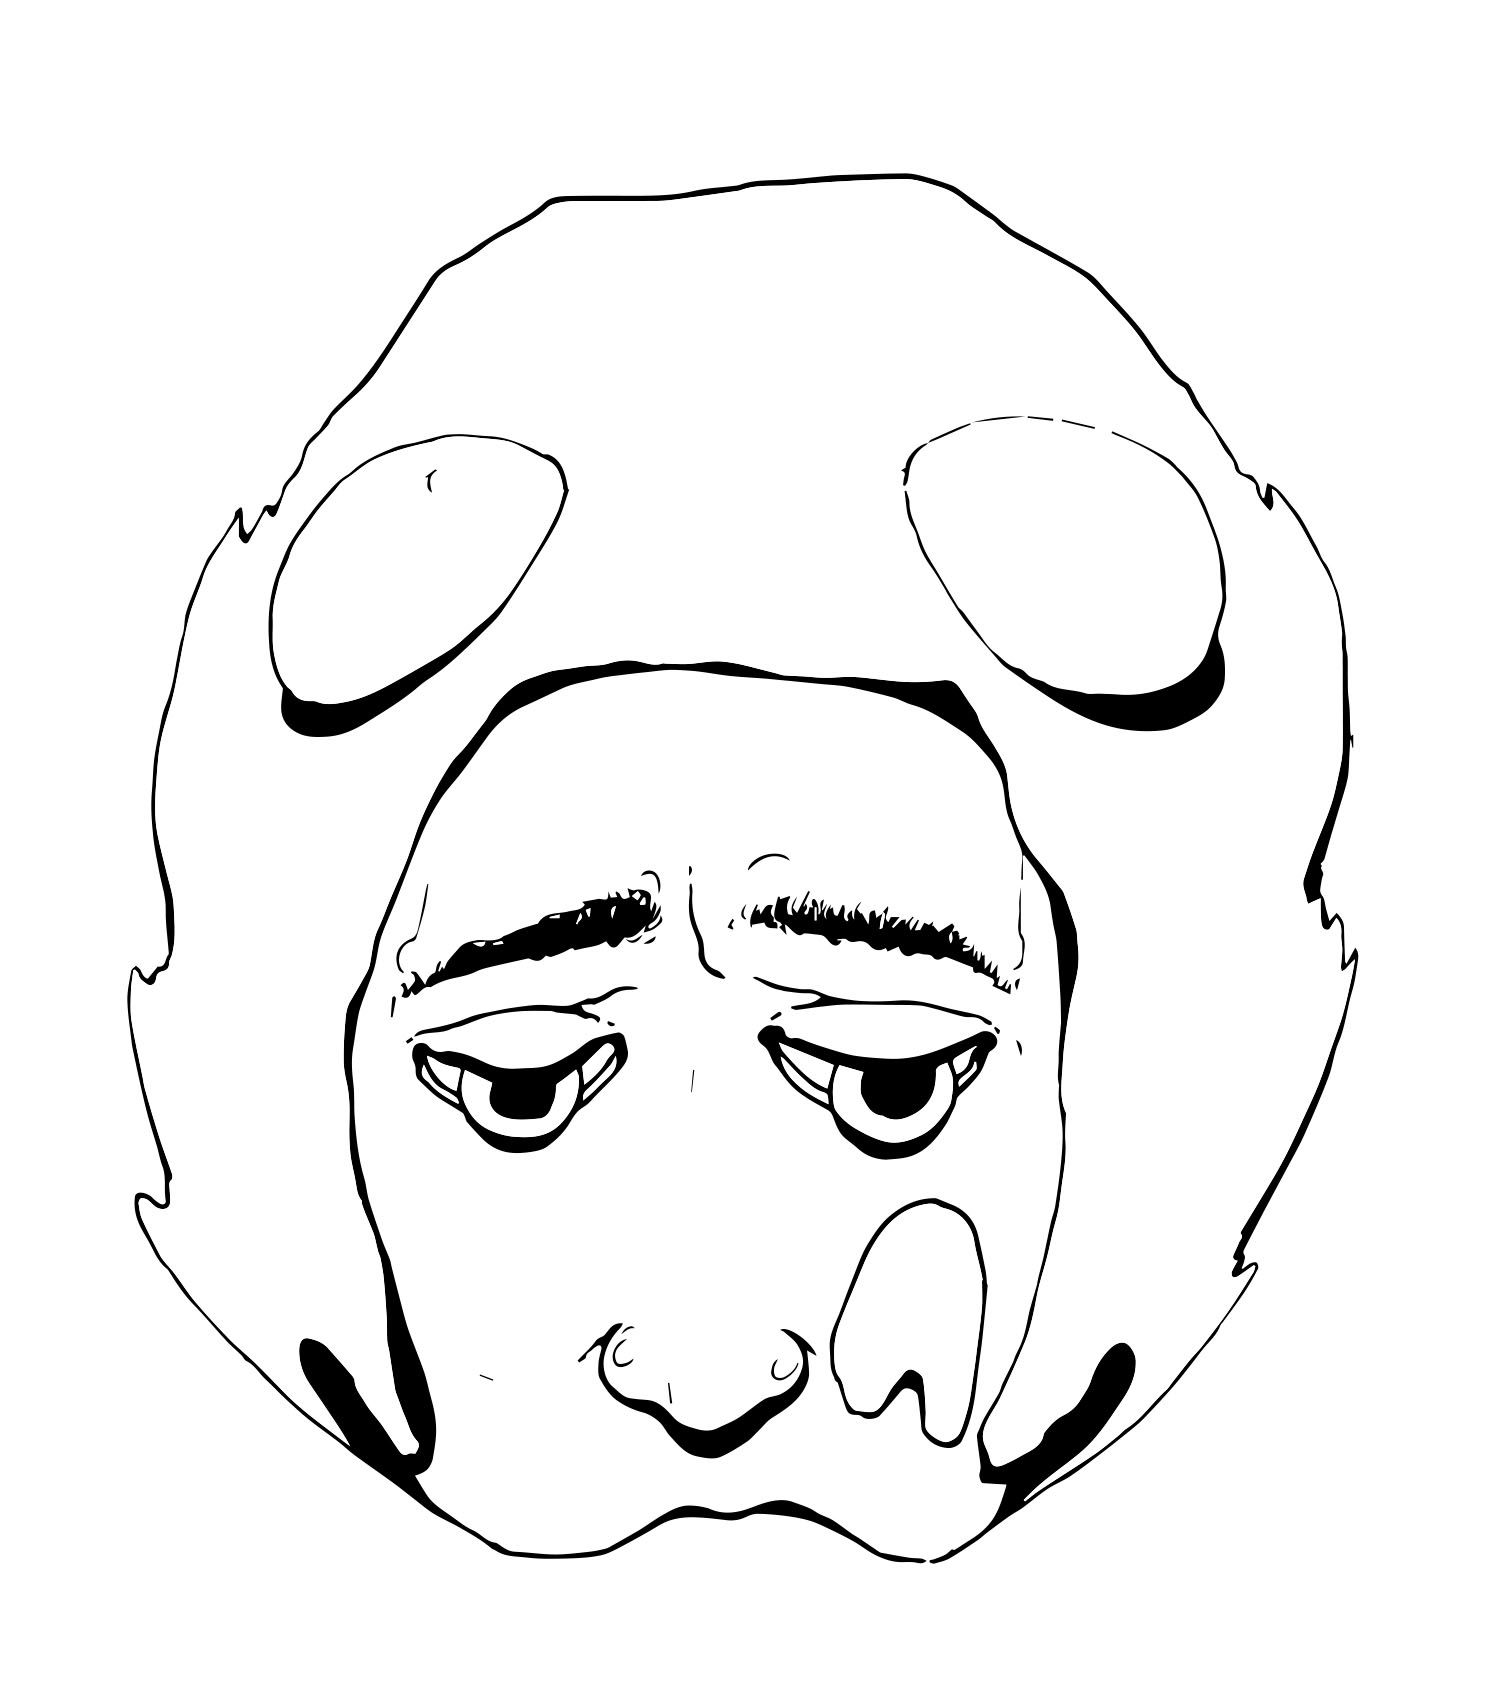 visage-compressor